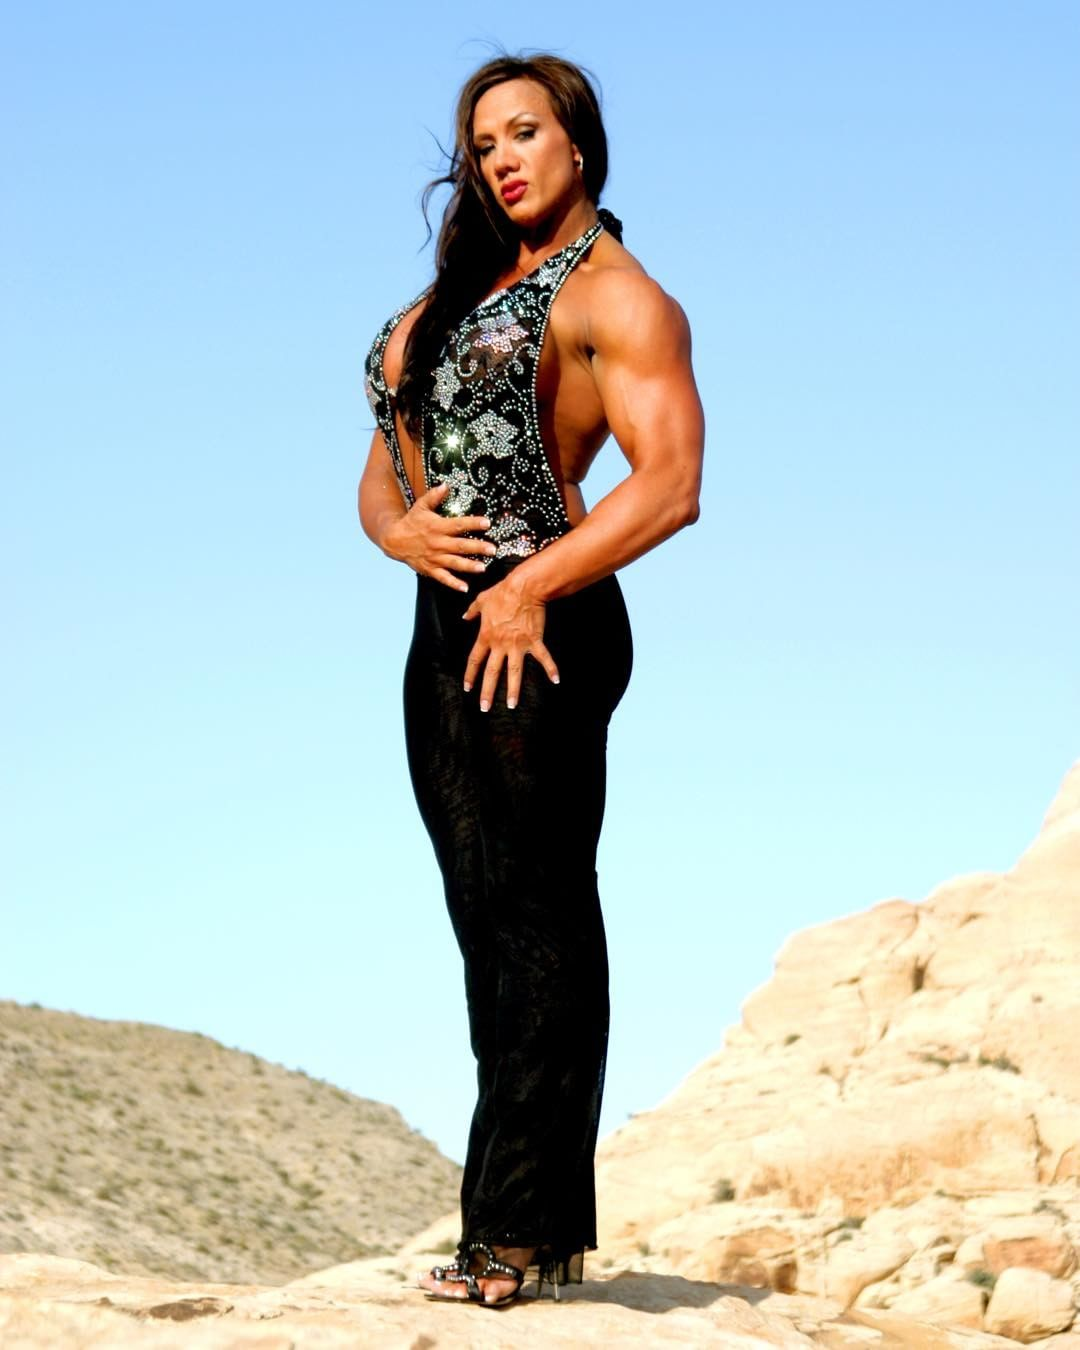 Image - Amber DeLuca 1.jpg | Pro Wrestling | FANDOM